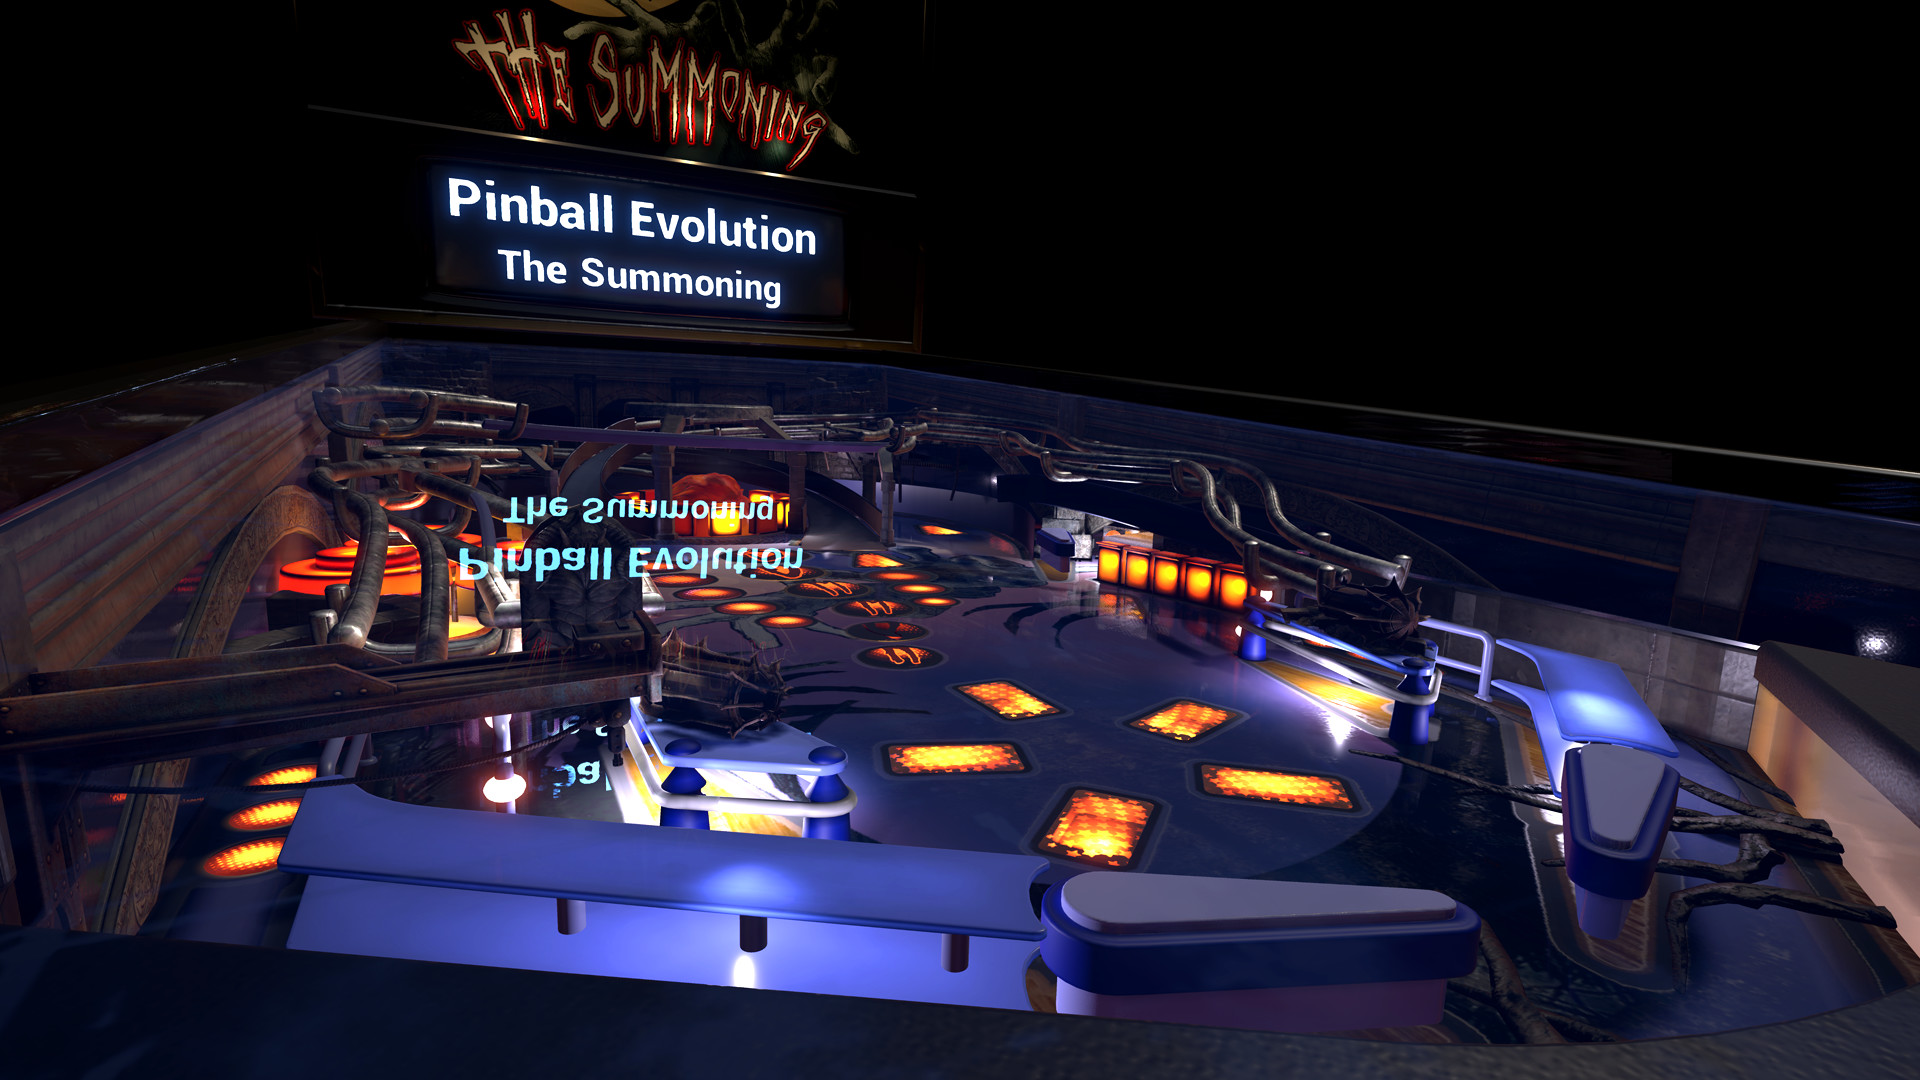 Pinball Evolution VR